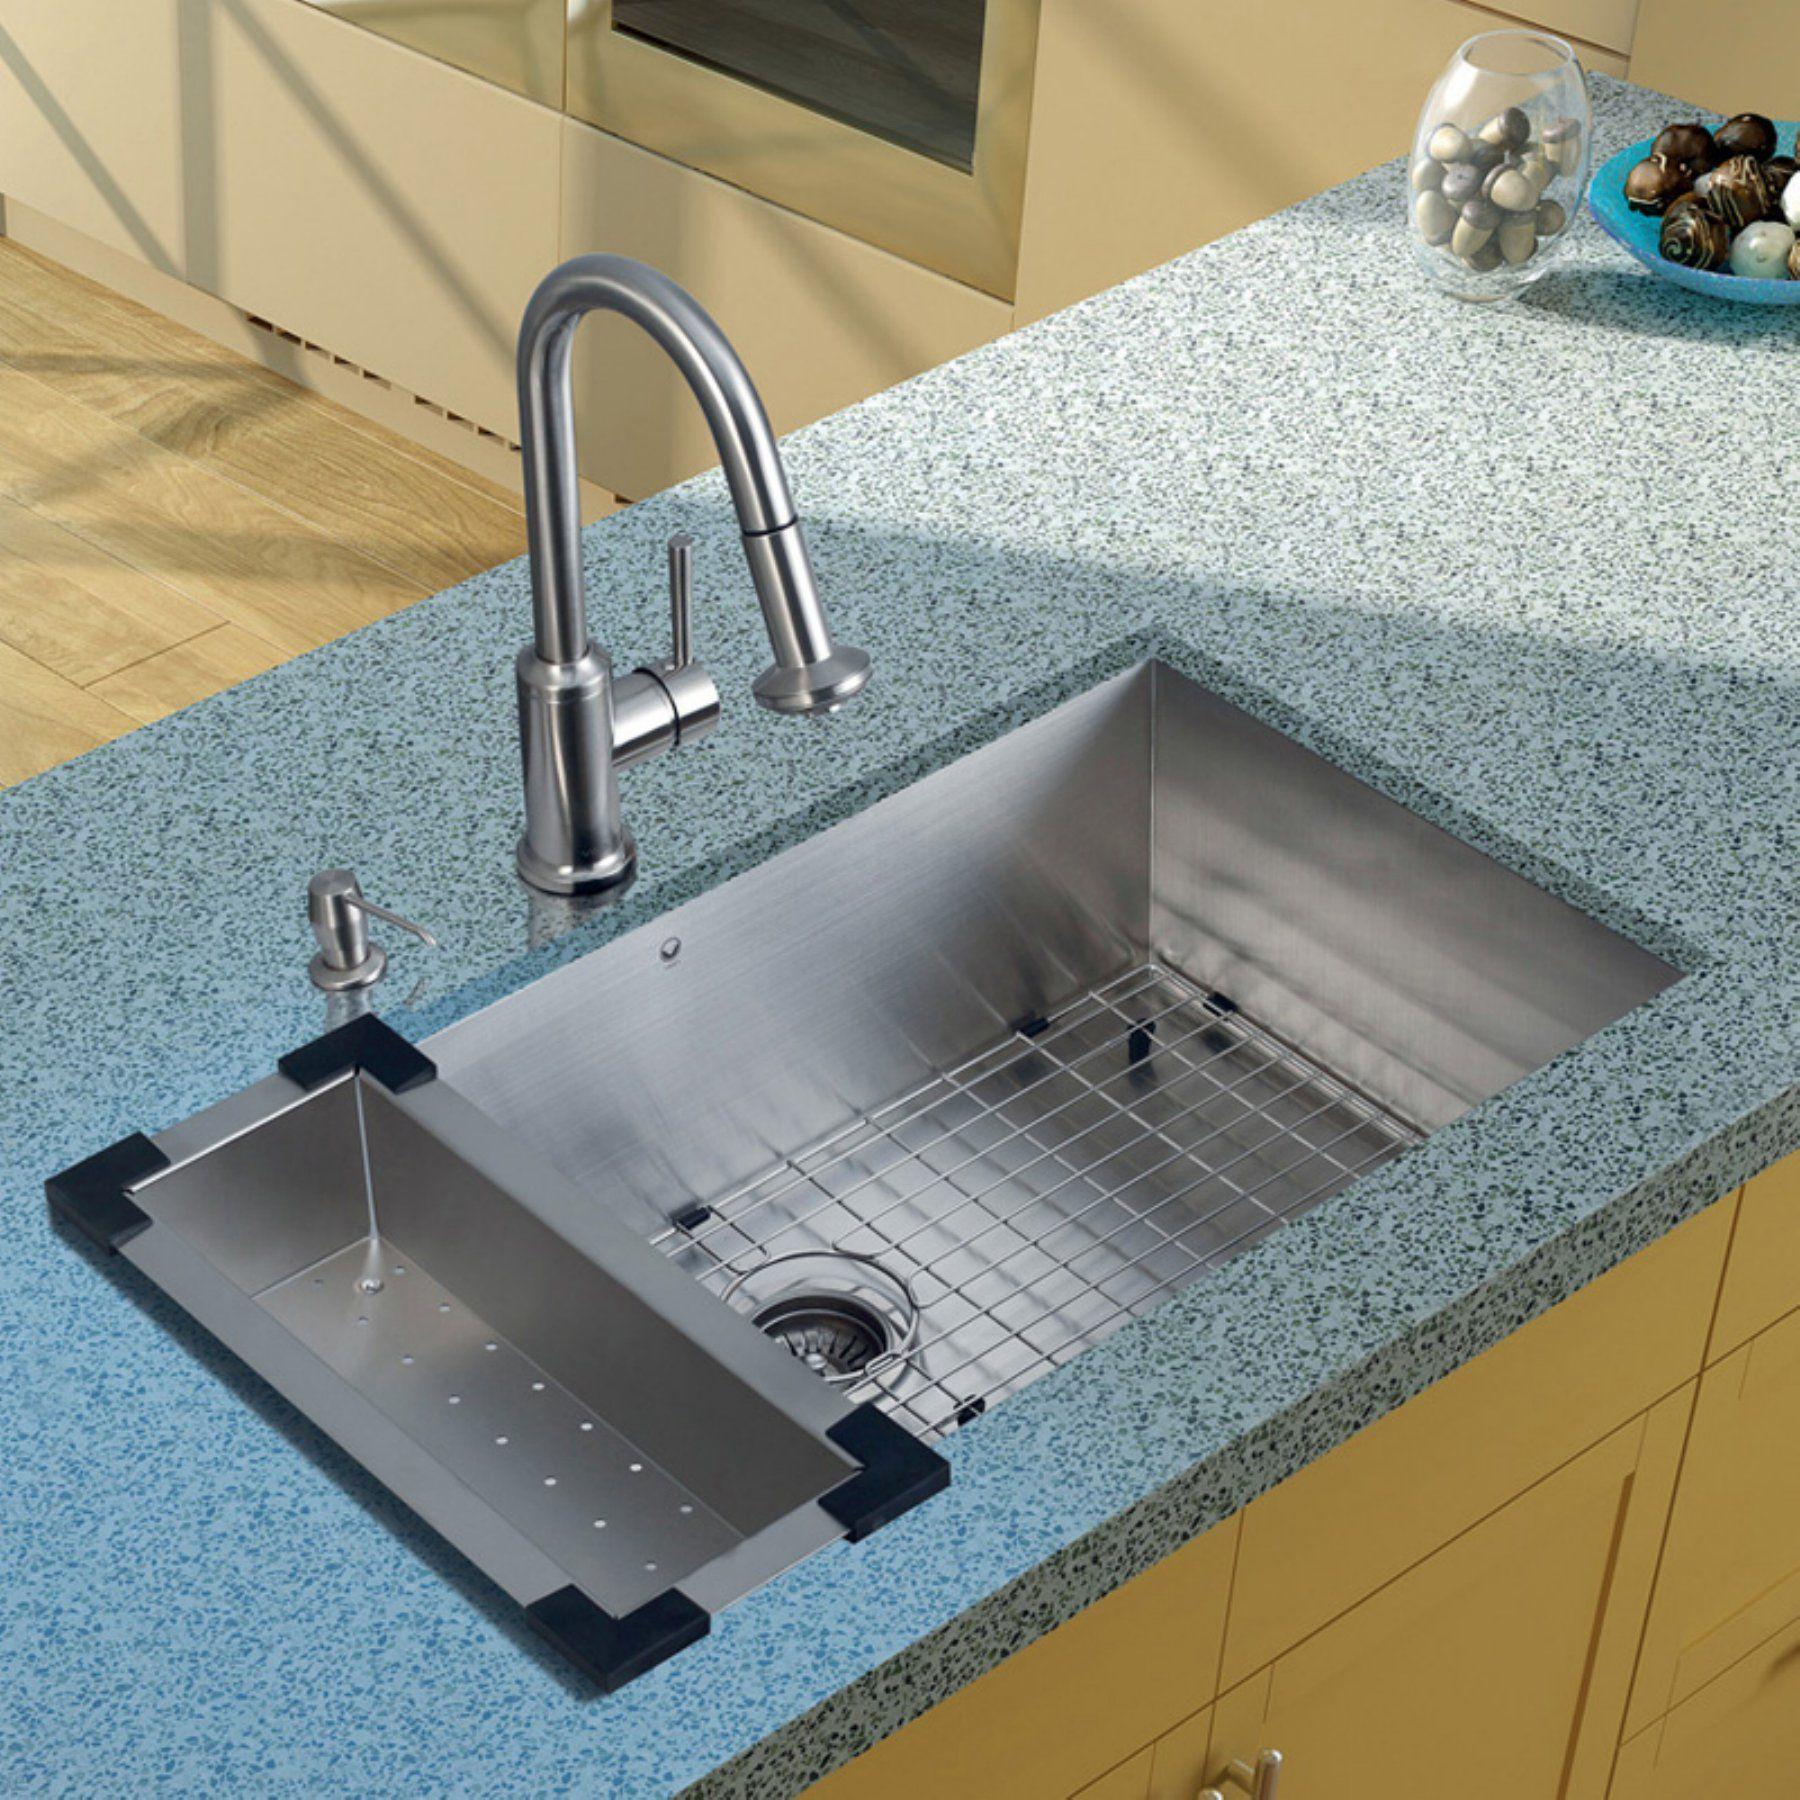 VIGO VG15070 Single Basin Undermount Kitchen Sink and Faucet Set - VG15070